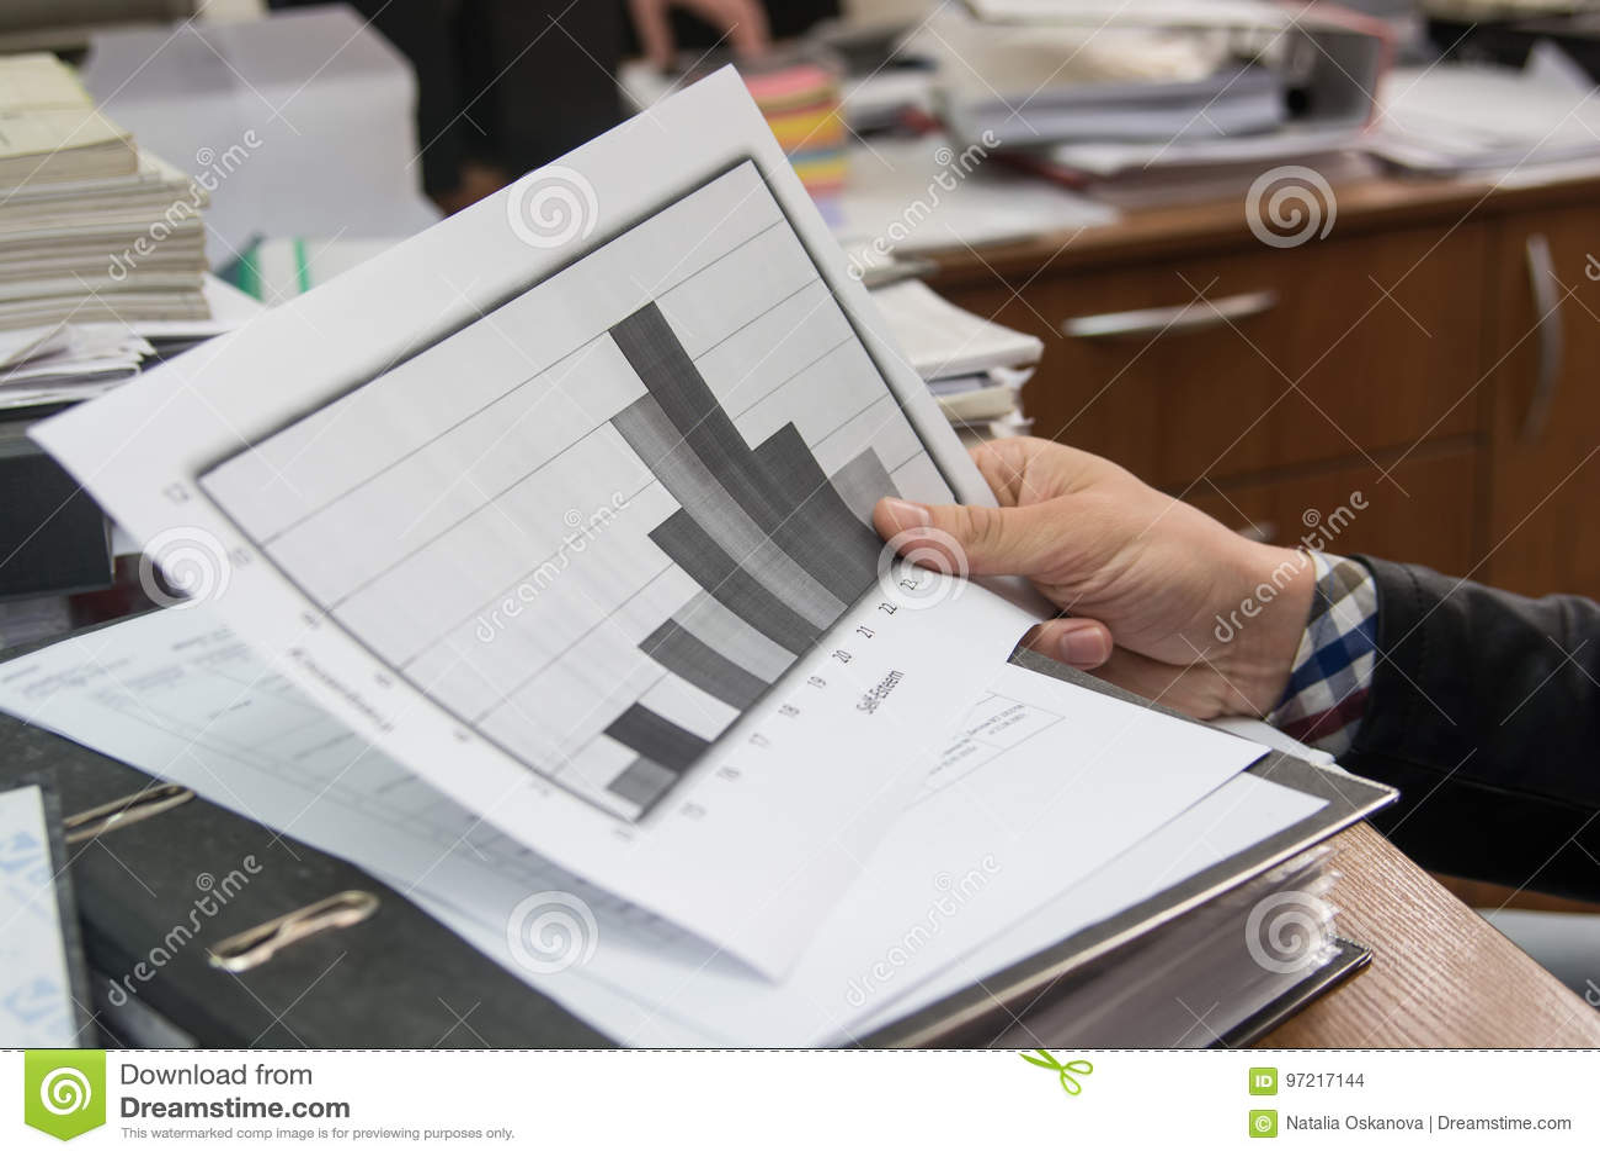 Business analyst examining diagram